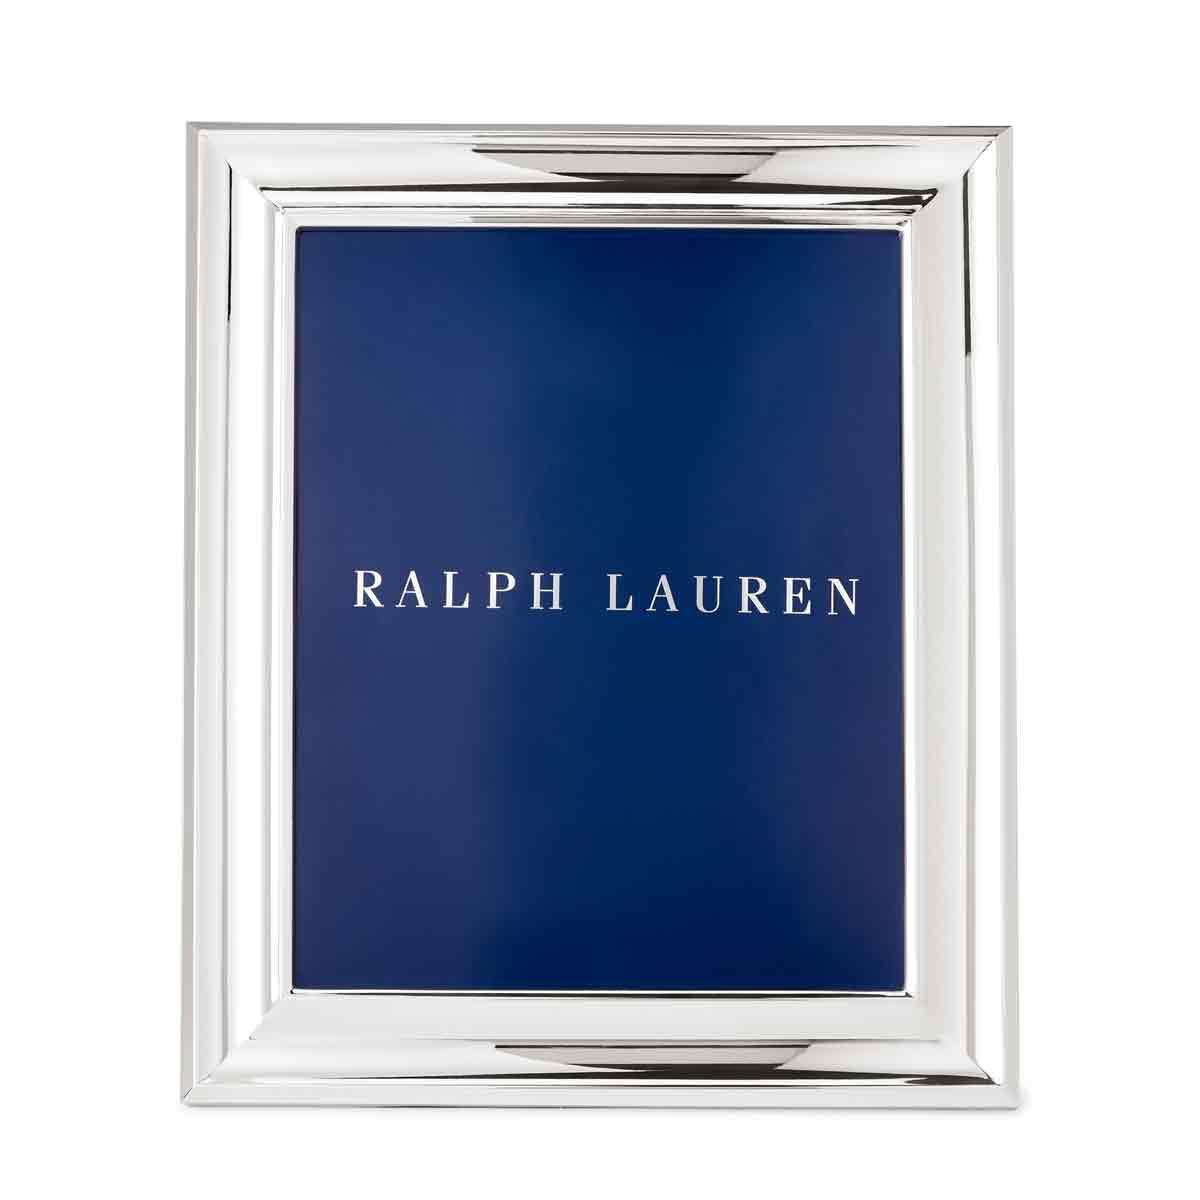 "Ralph Lauren Olivier 5x7"" Picture Frame"